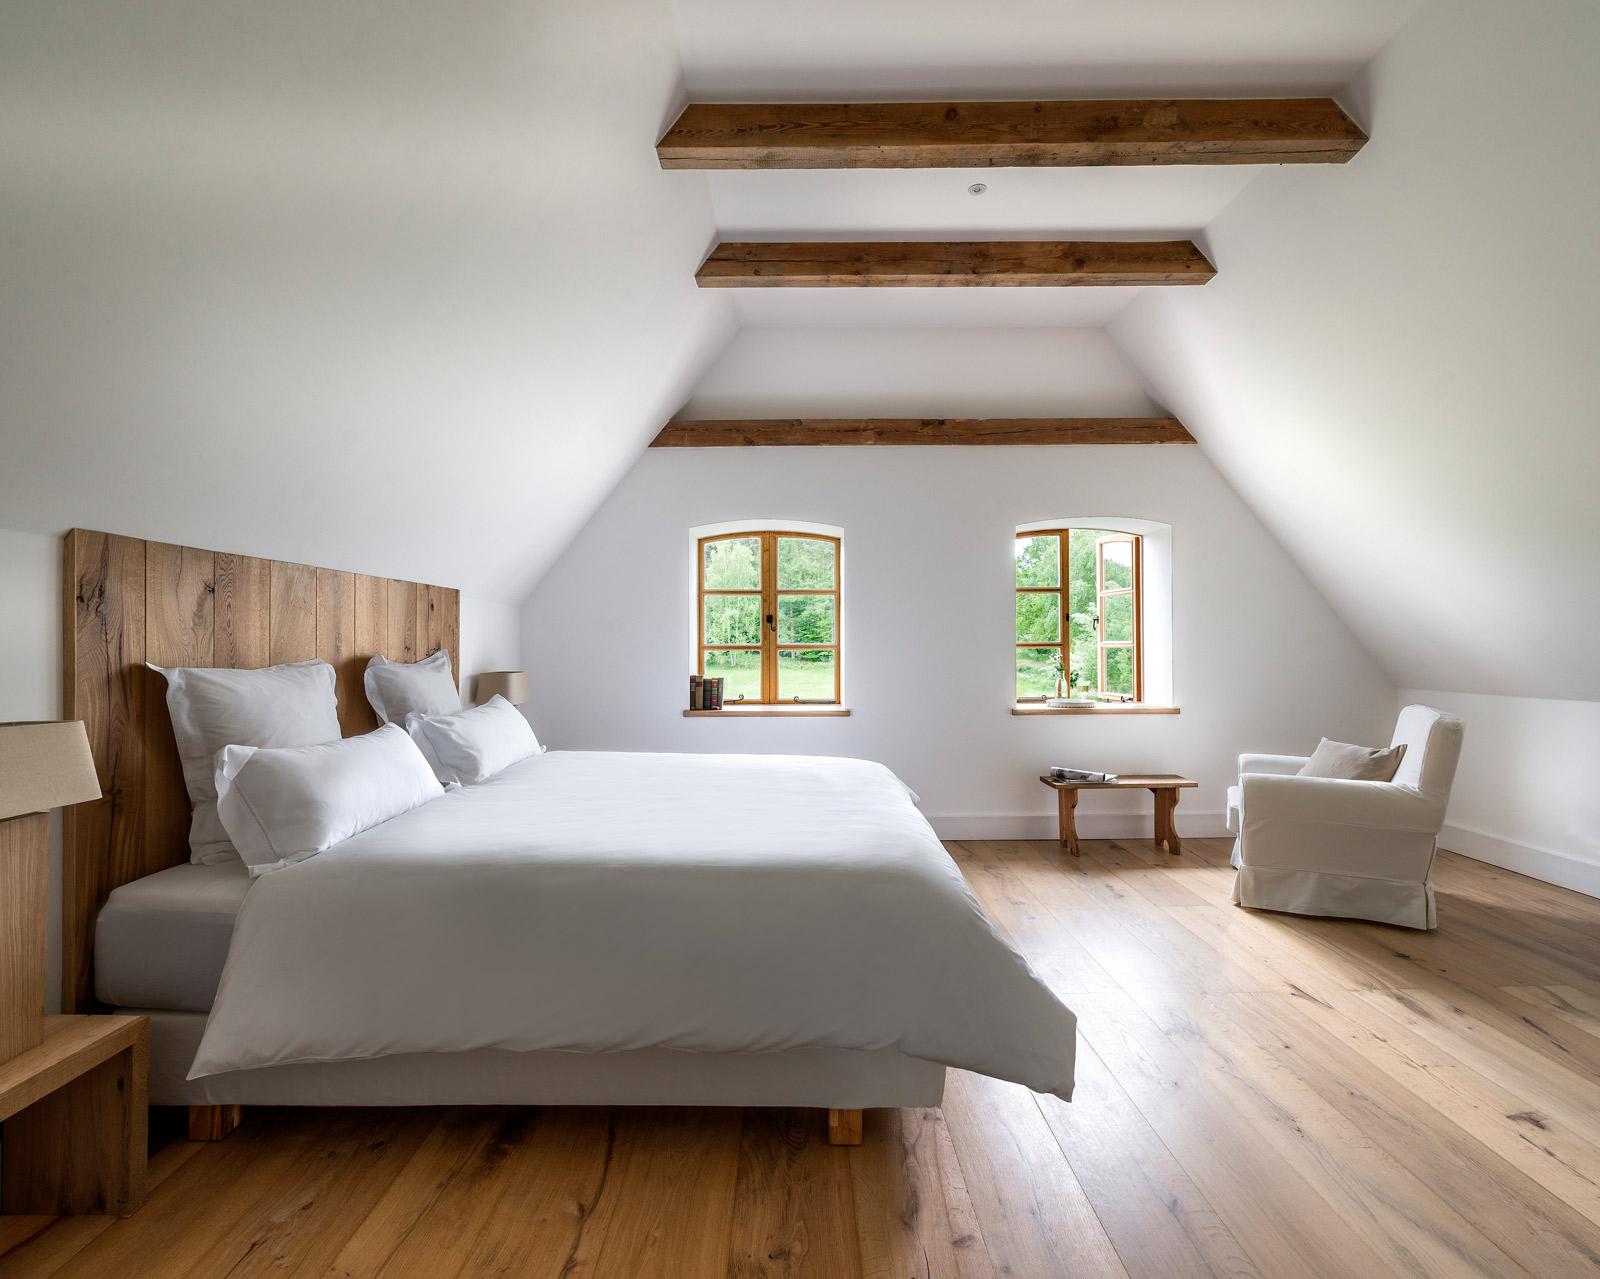 badezimmerlampen retro inspiration f r die gestaltung der besten r ume. Black Bedroom Furniture Sets. Home Design Ideas